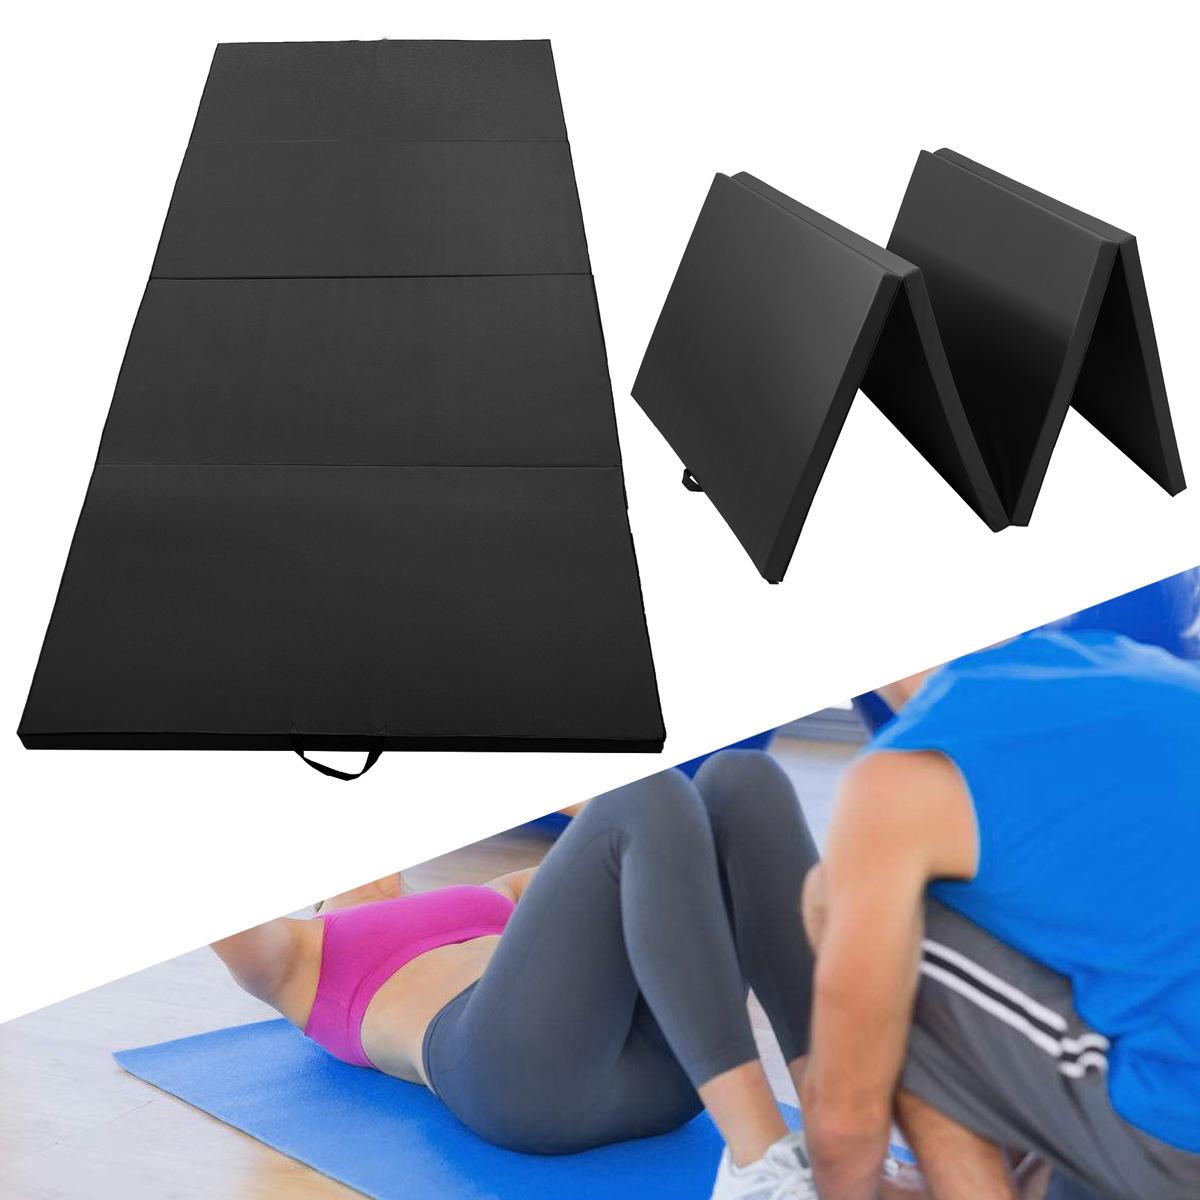 118x47 2x1 97inch Gymnastics Mat Home Gym Folding Panel Sports Yoga Exercise Tumbling Fitness Pad